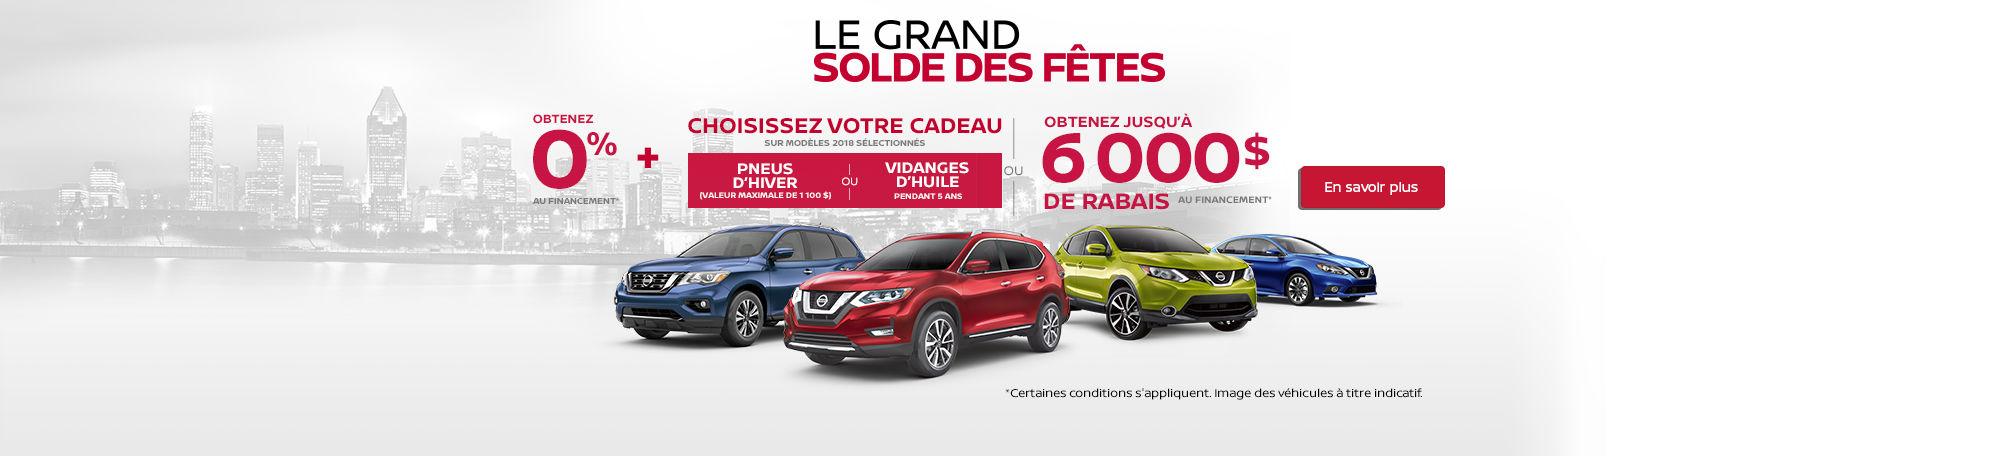 La grande liquidation Nissan!